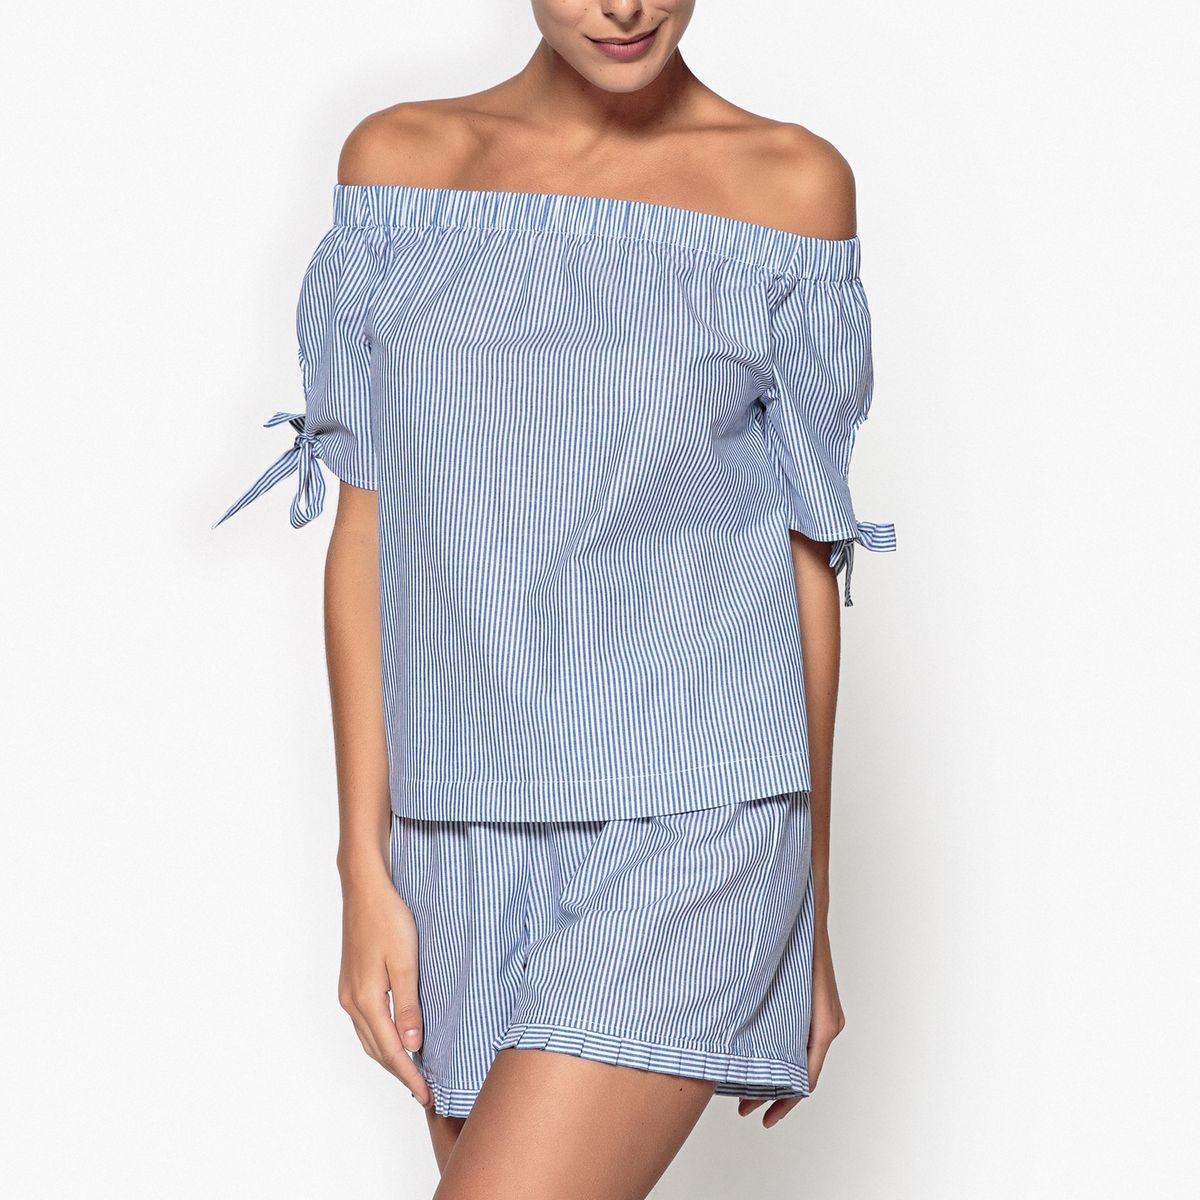 Pyjashort fines rayures